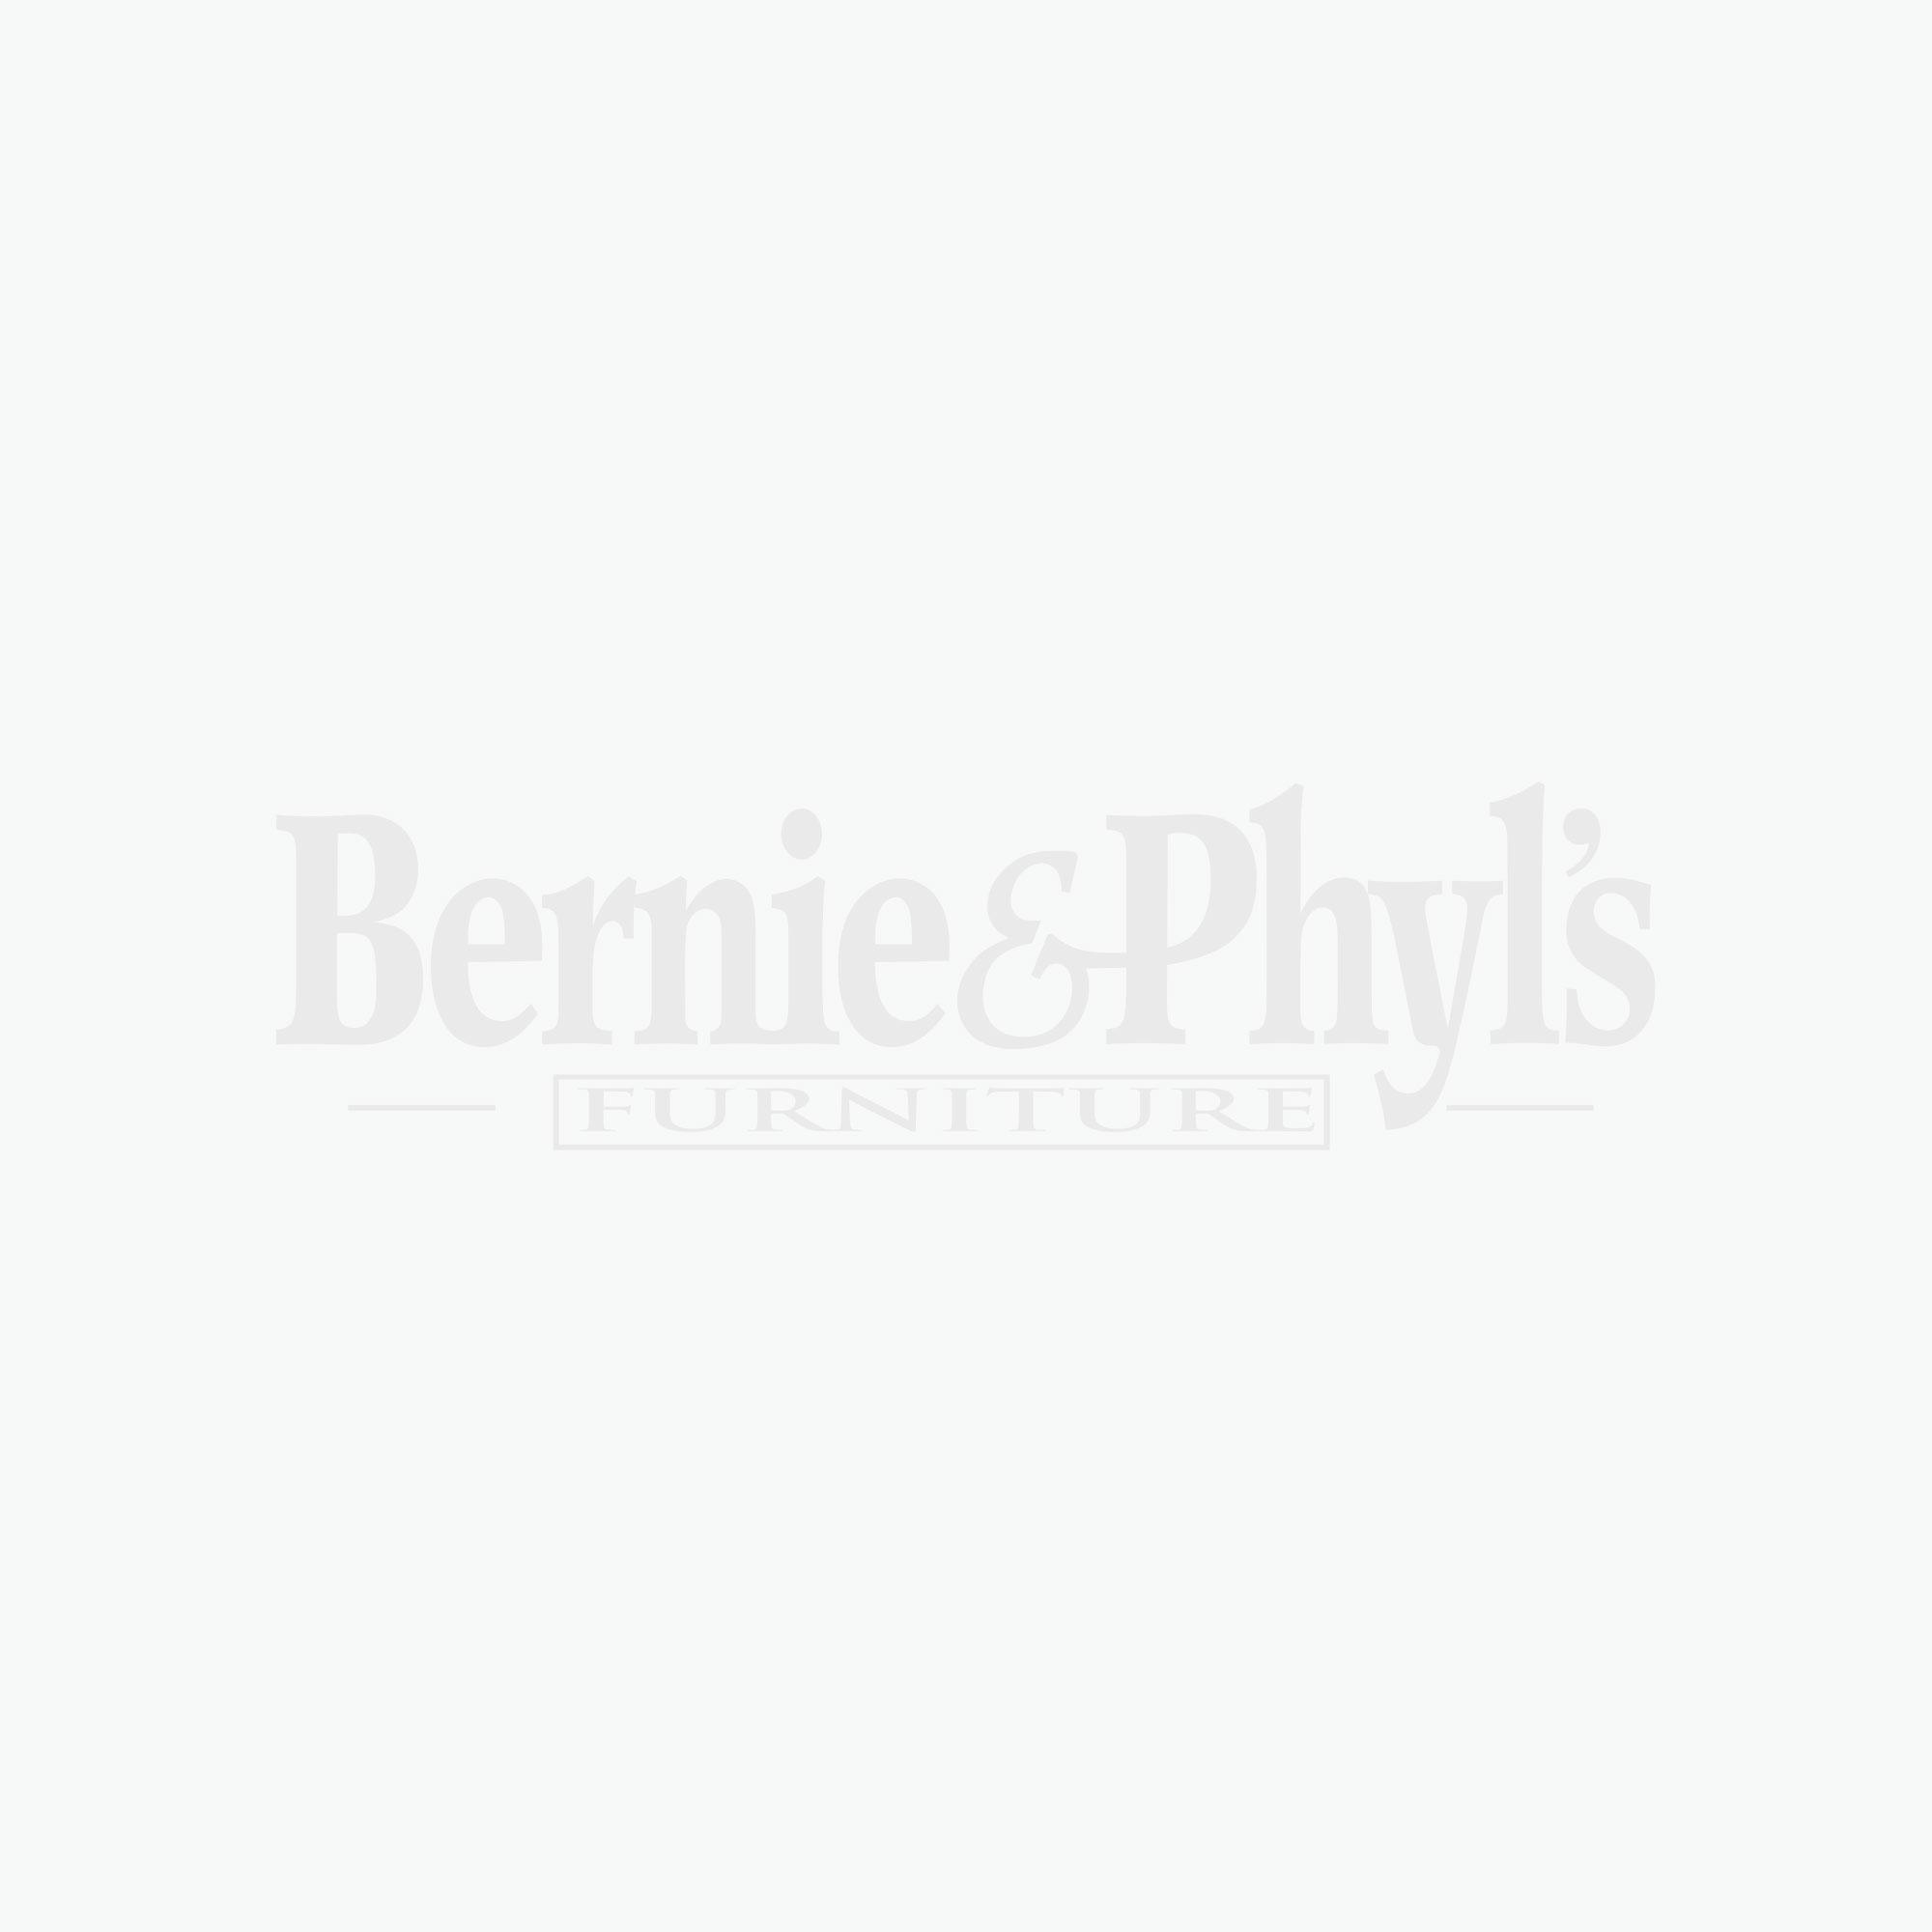 Tempur-Pedic Legacy Mattress